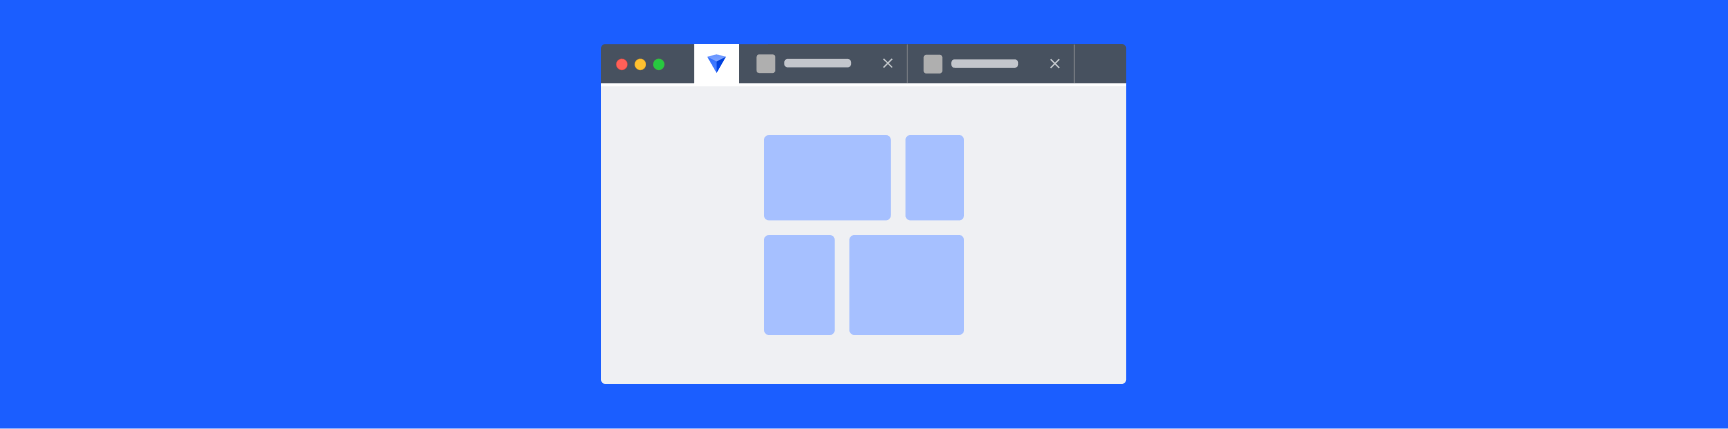 Firefox Panorama logo inside a browser window